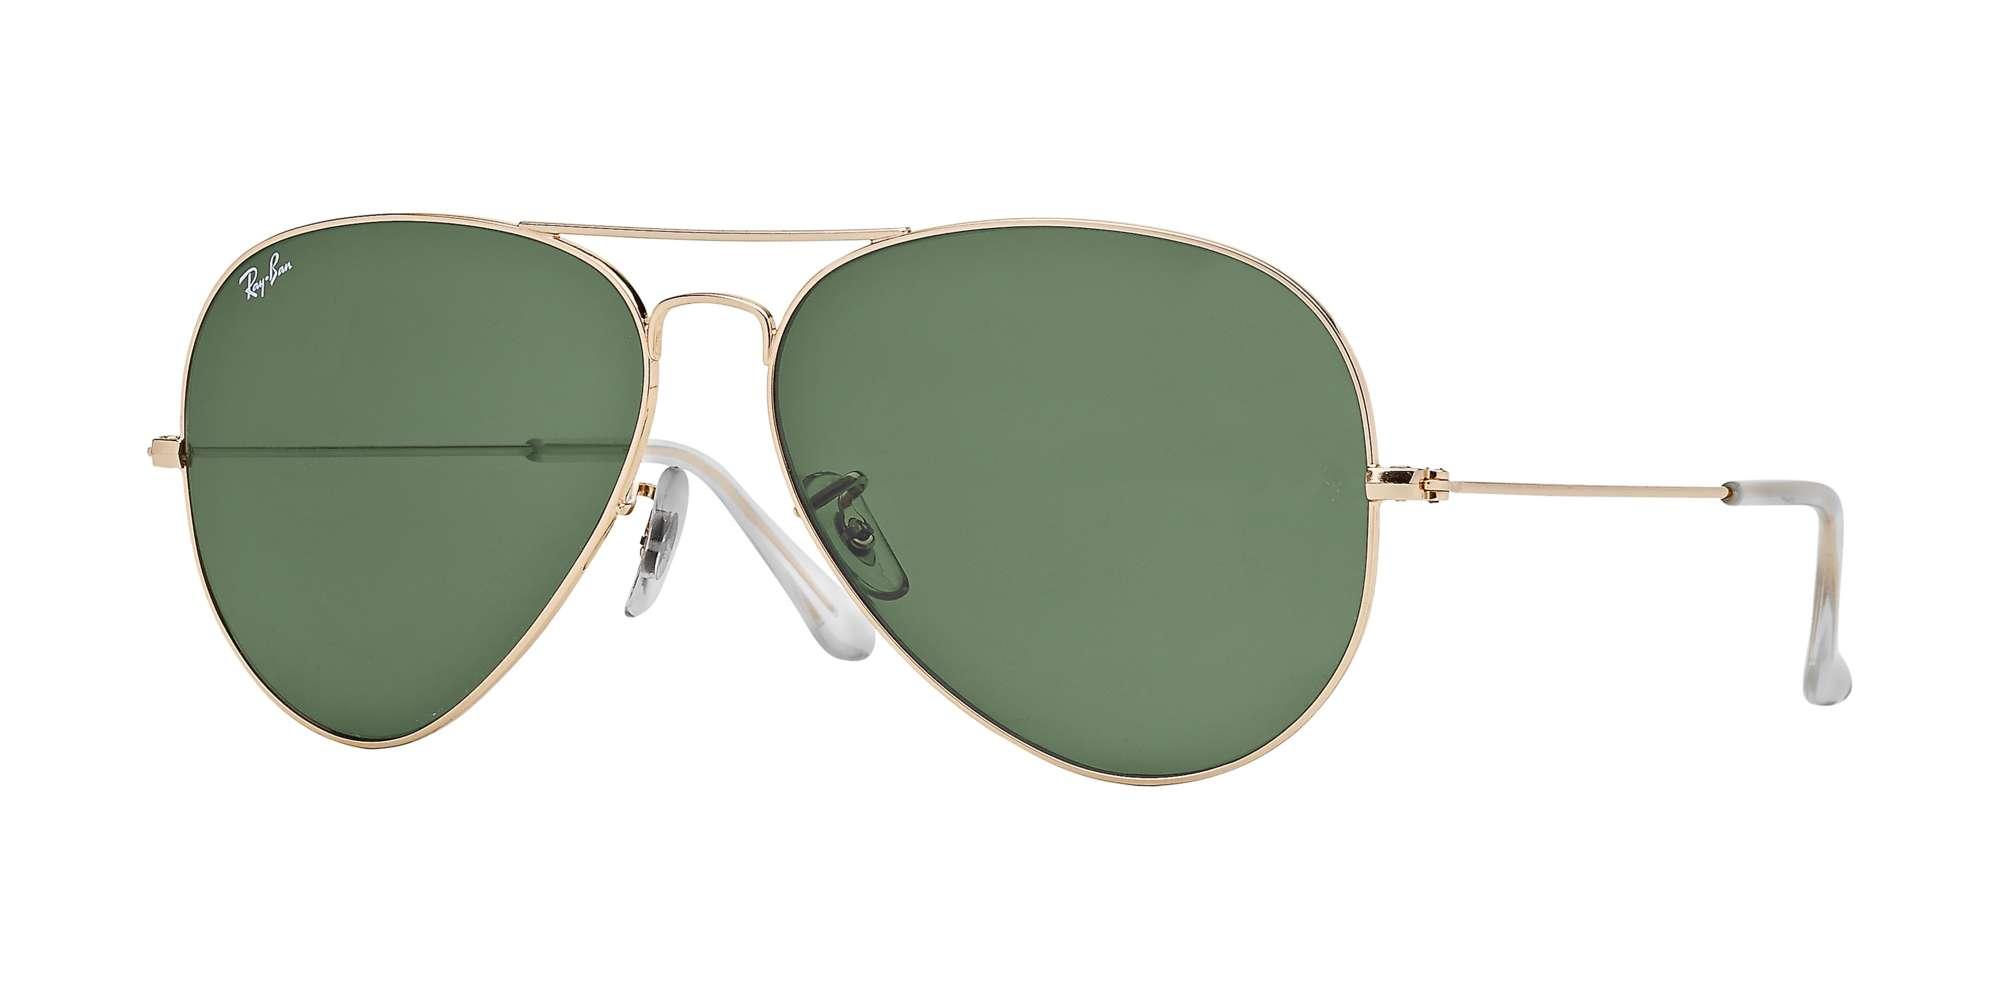 GOLD / GREY GREEN lenses